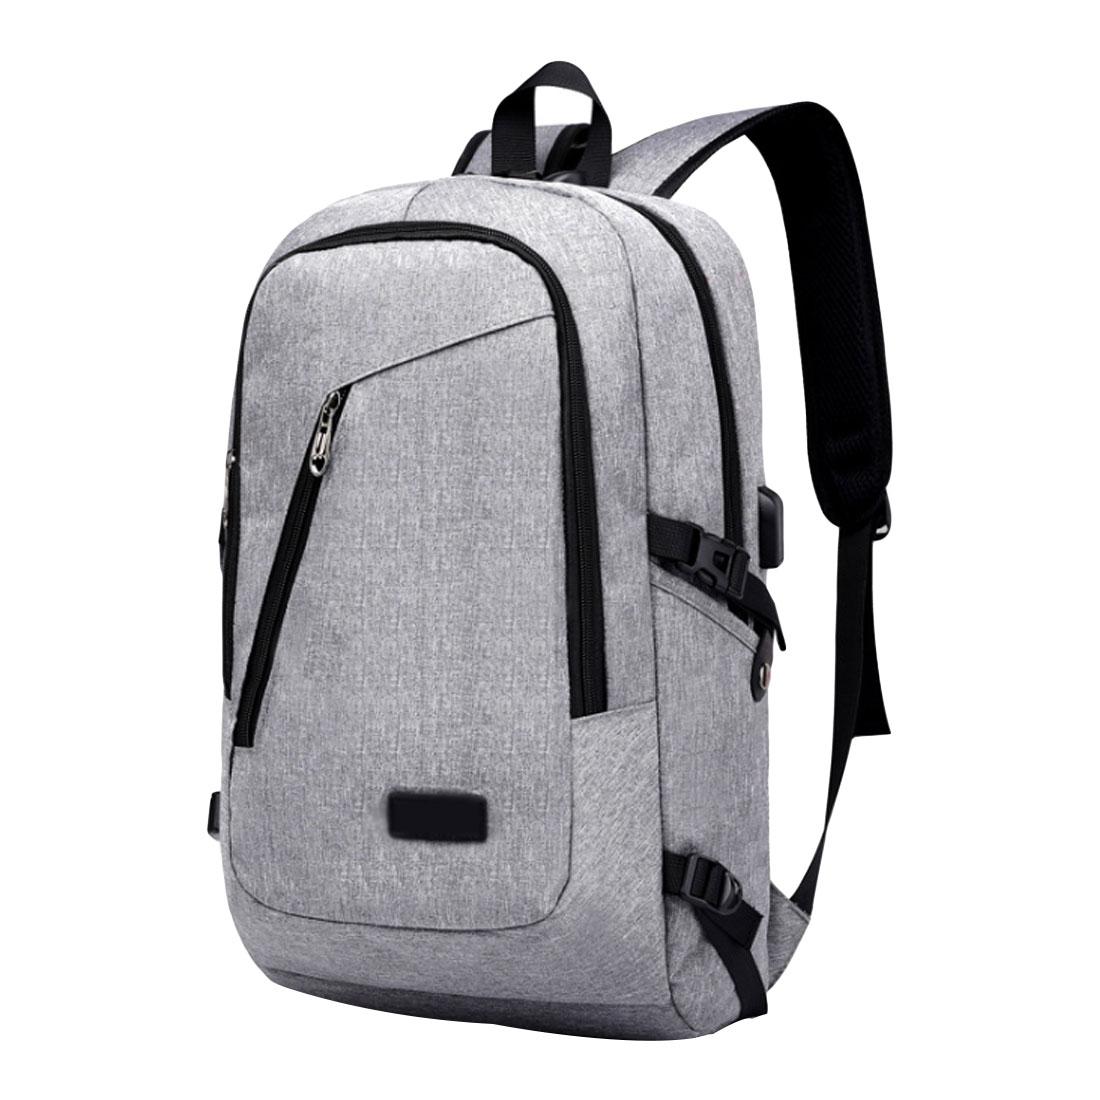 Simple Canvas Backpack School Bag For Teenagers Student Book Laptop Back Pack Travel Men Satchel Rucksack